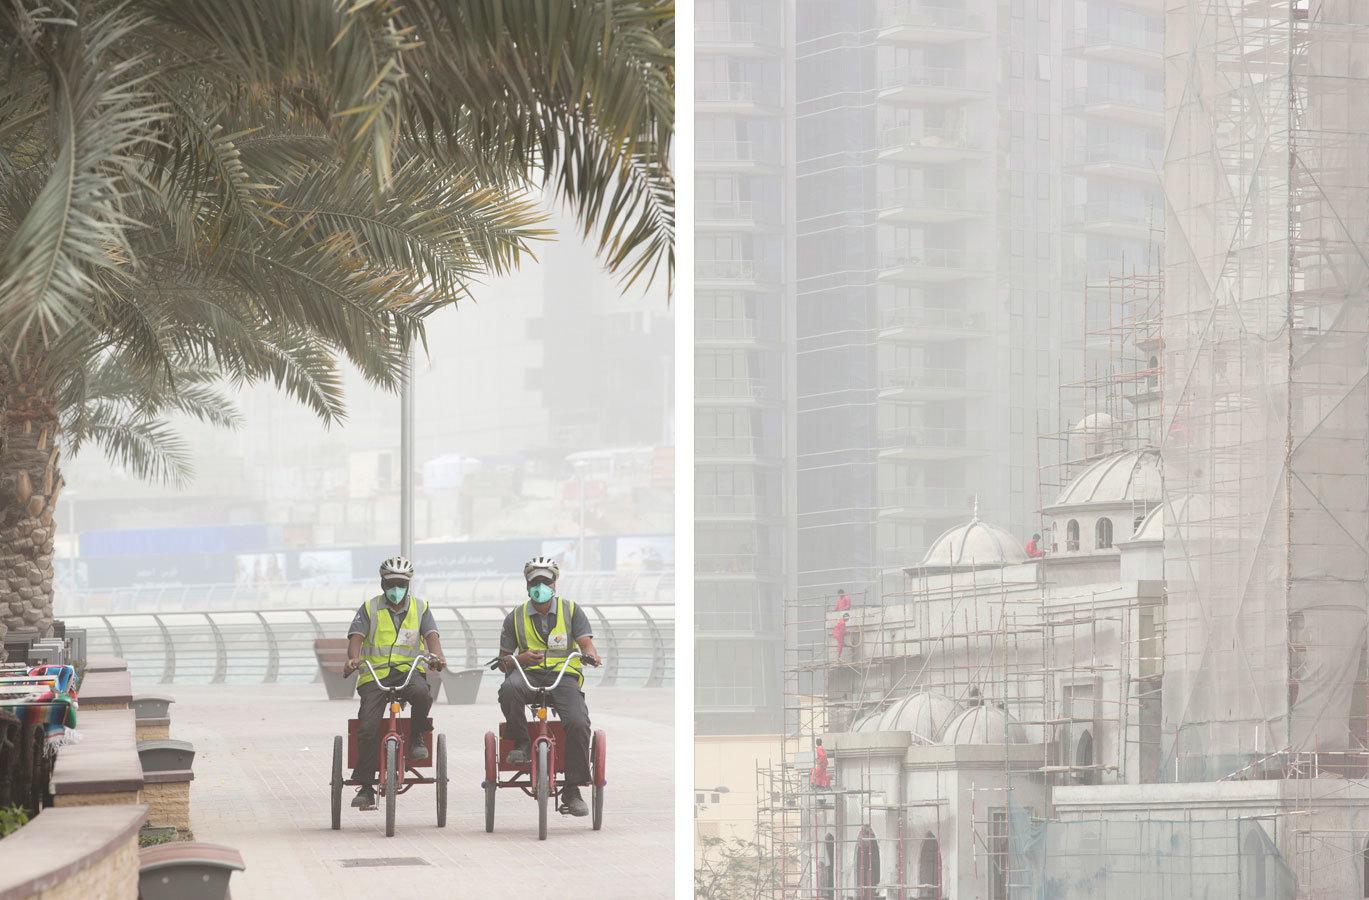 Sandstorm - Dubai Marina